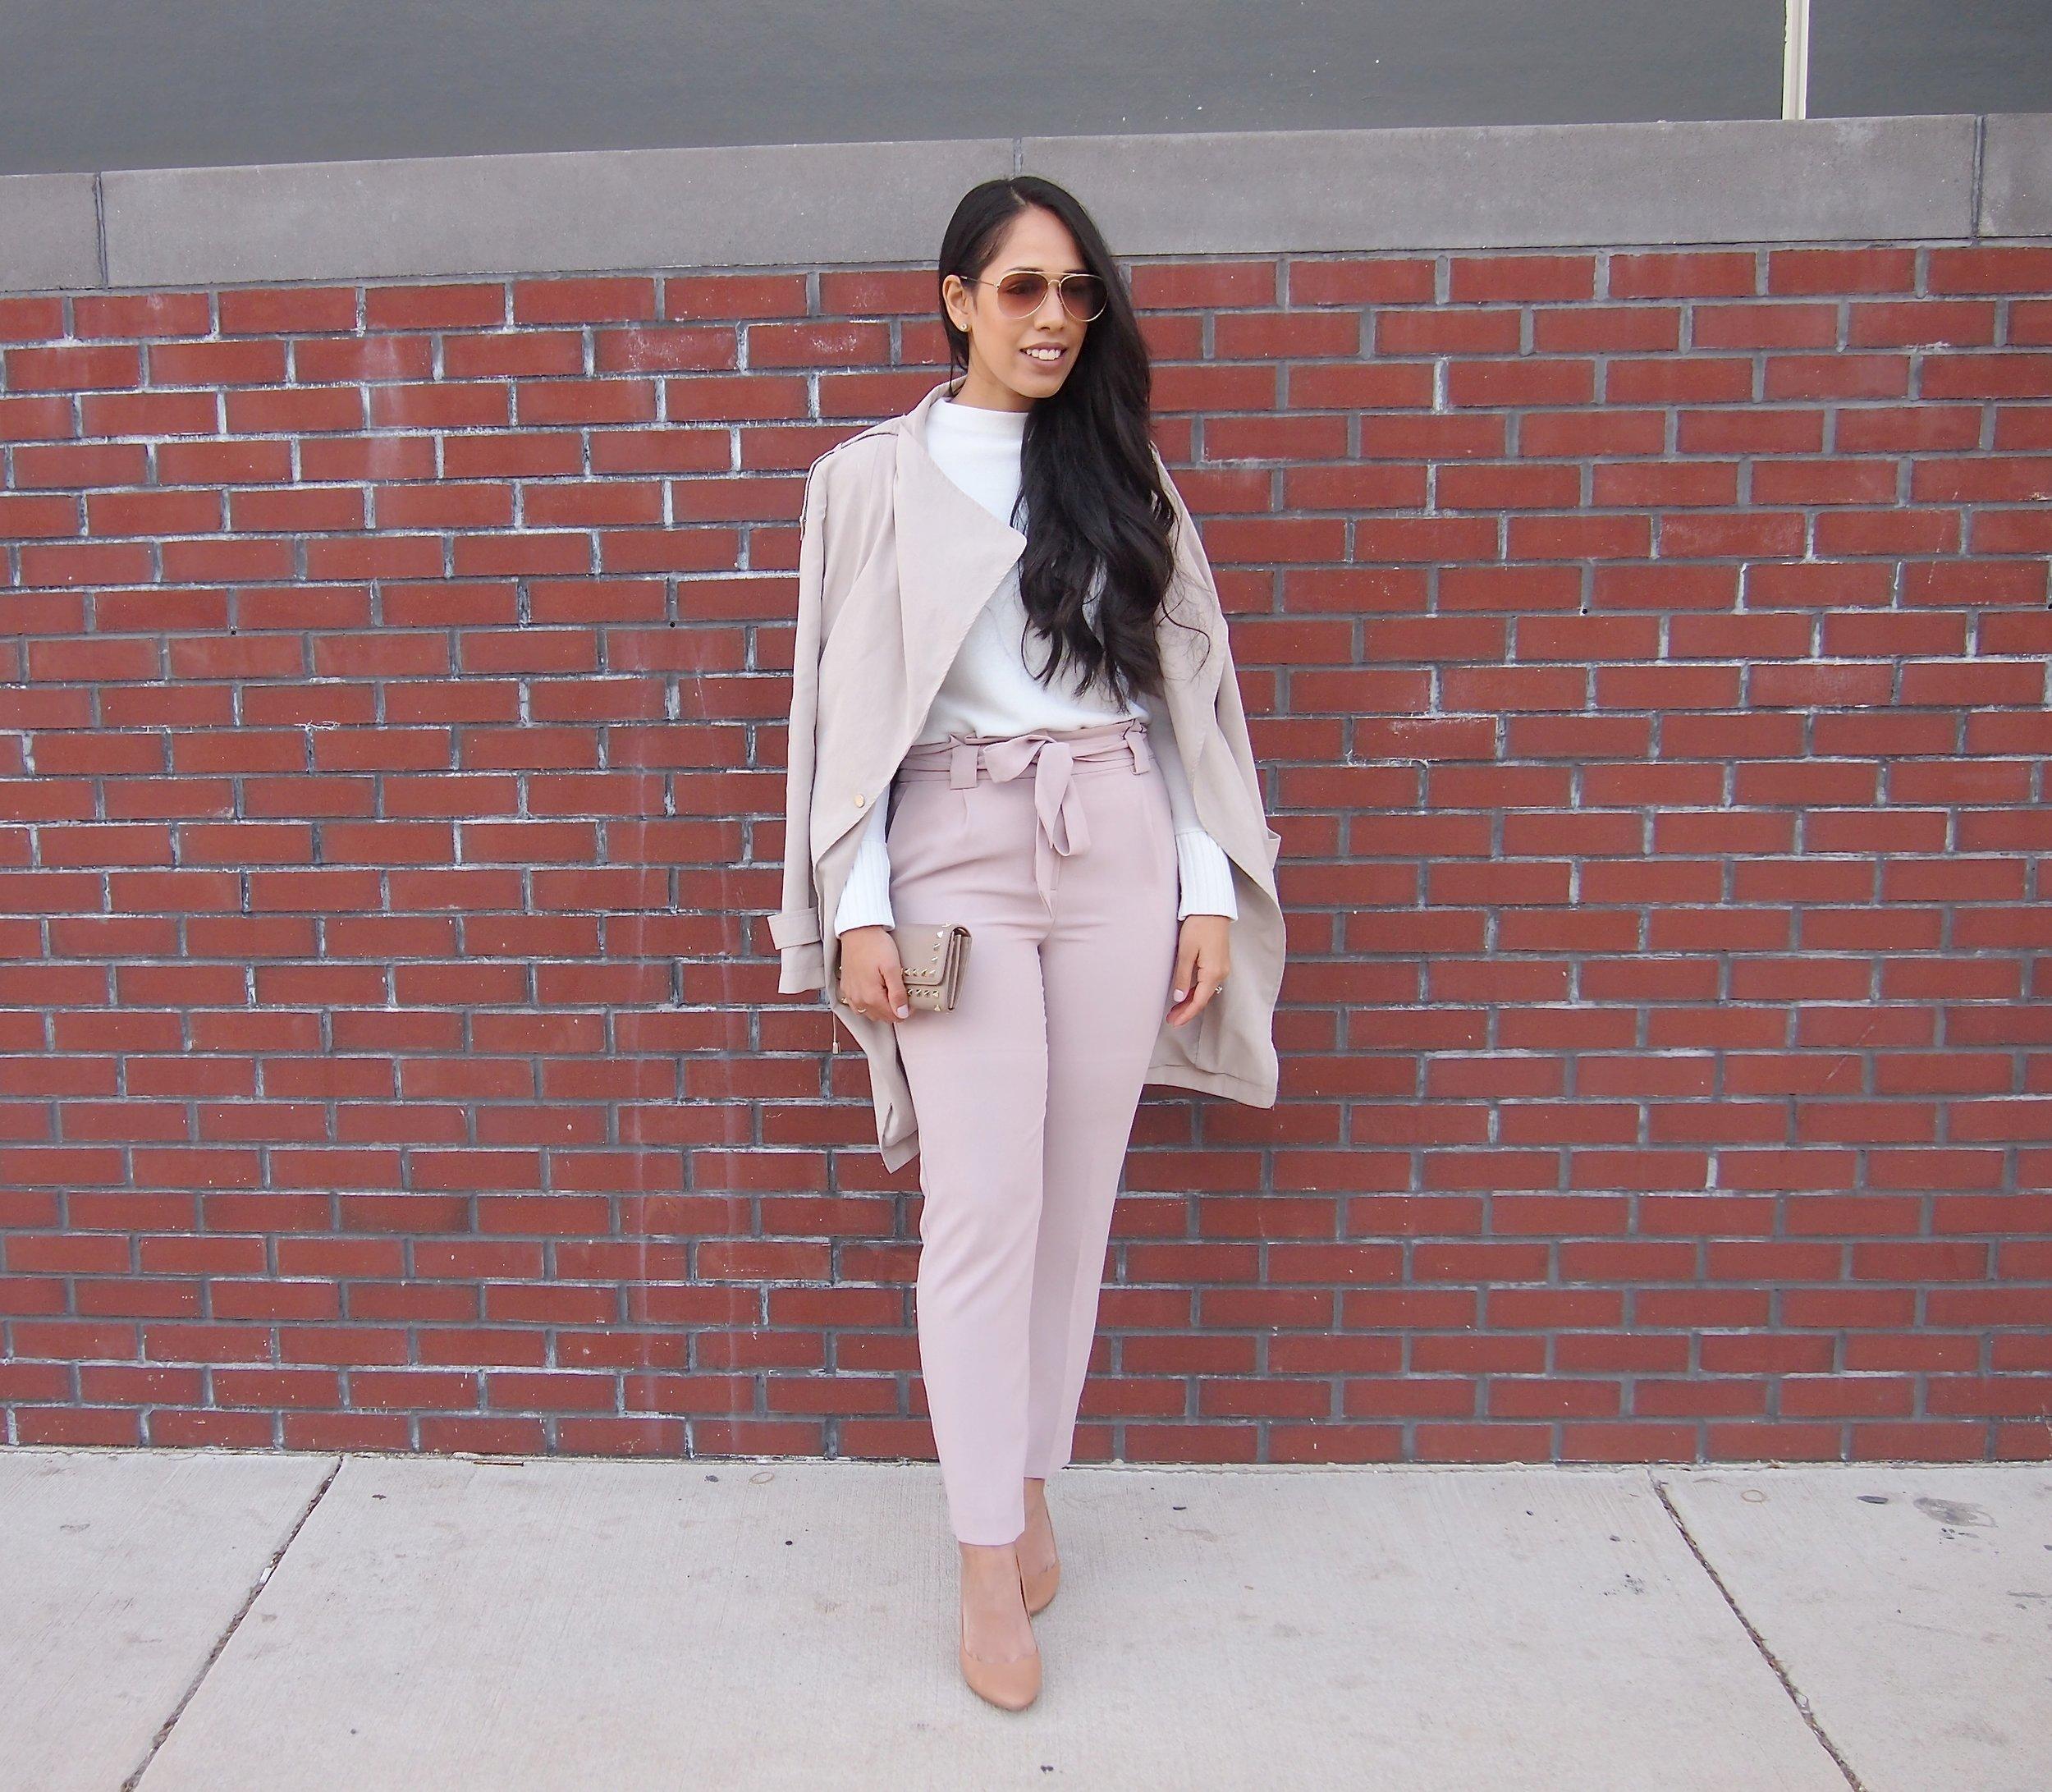 winter-fashion-trend-high-waist-pants